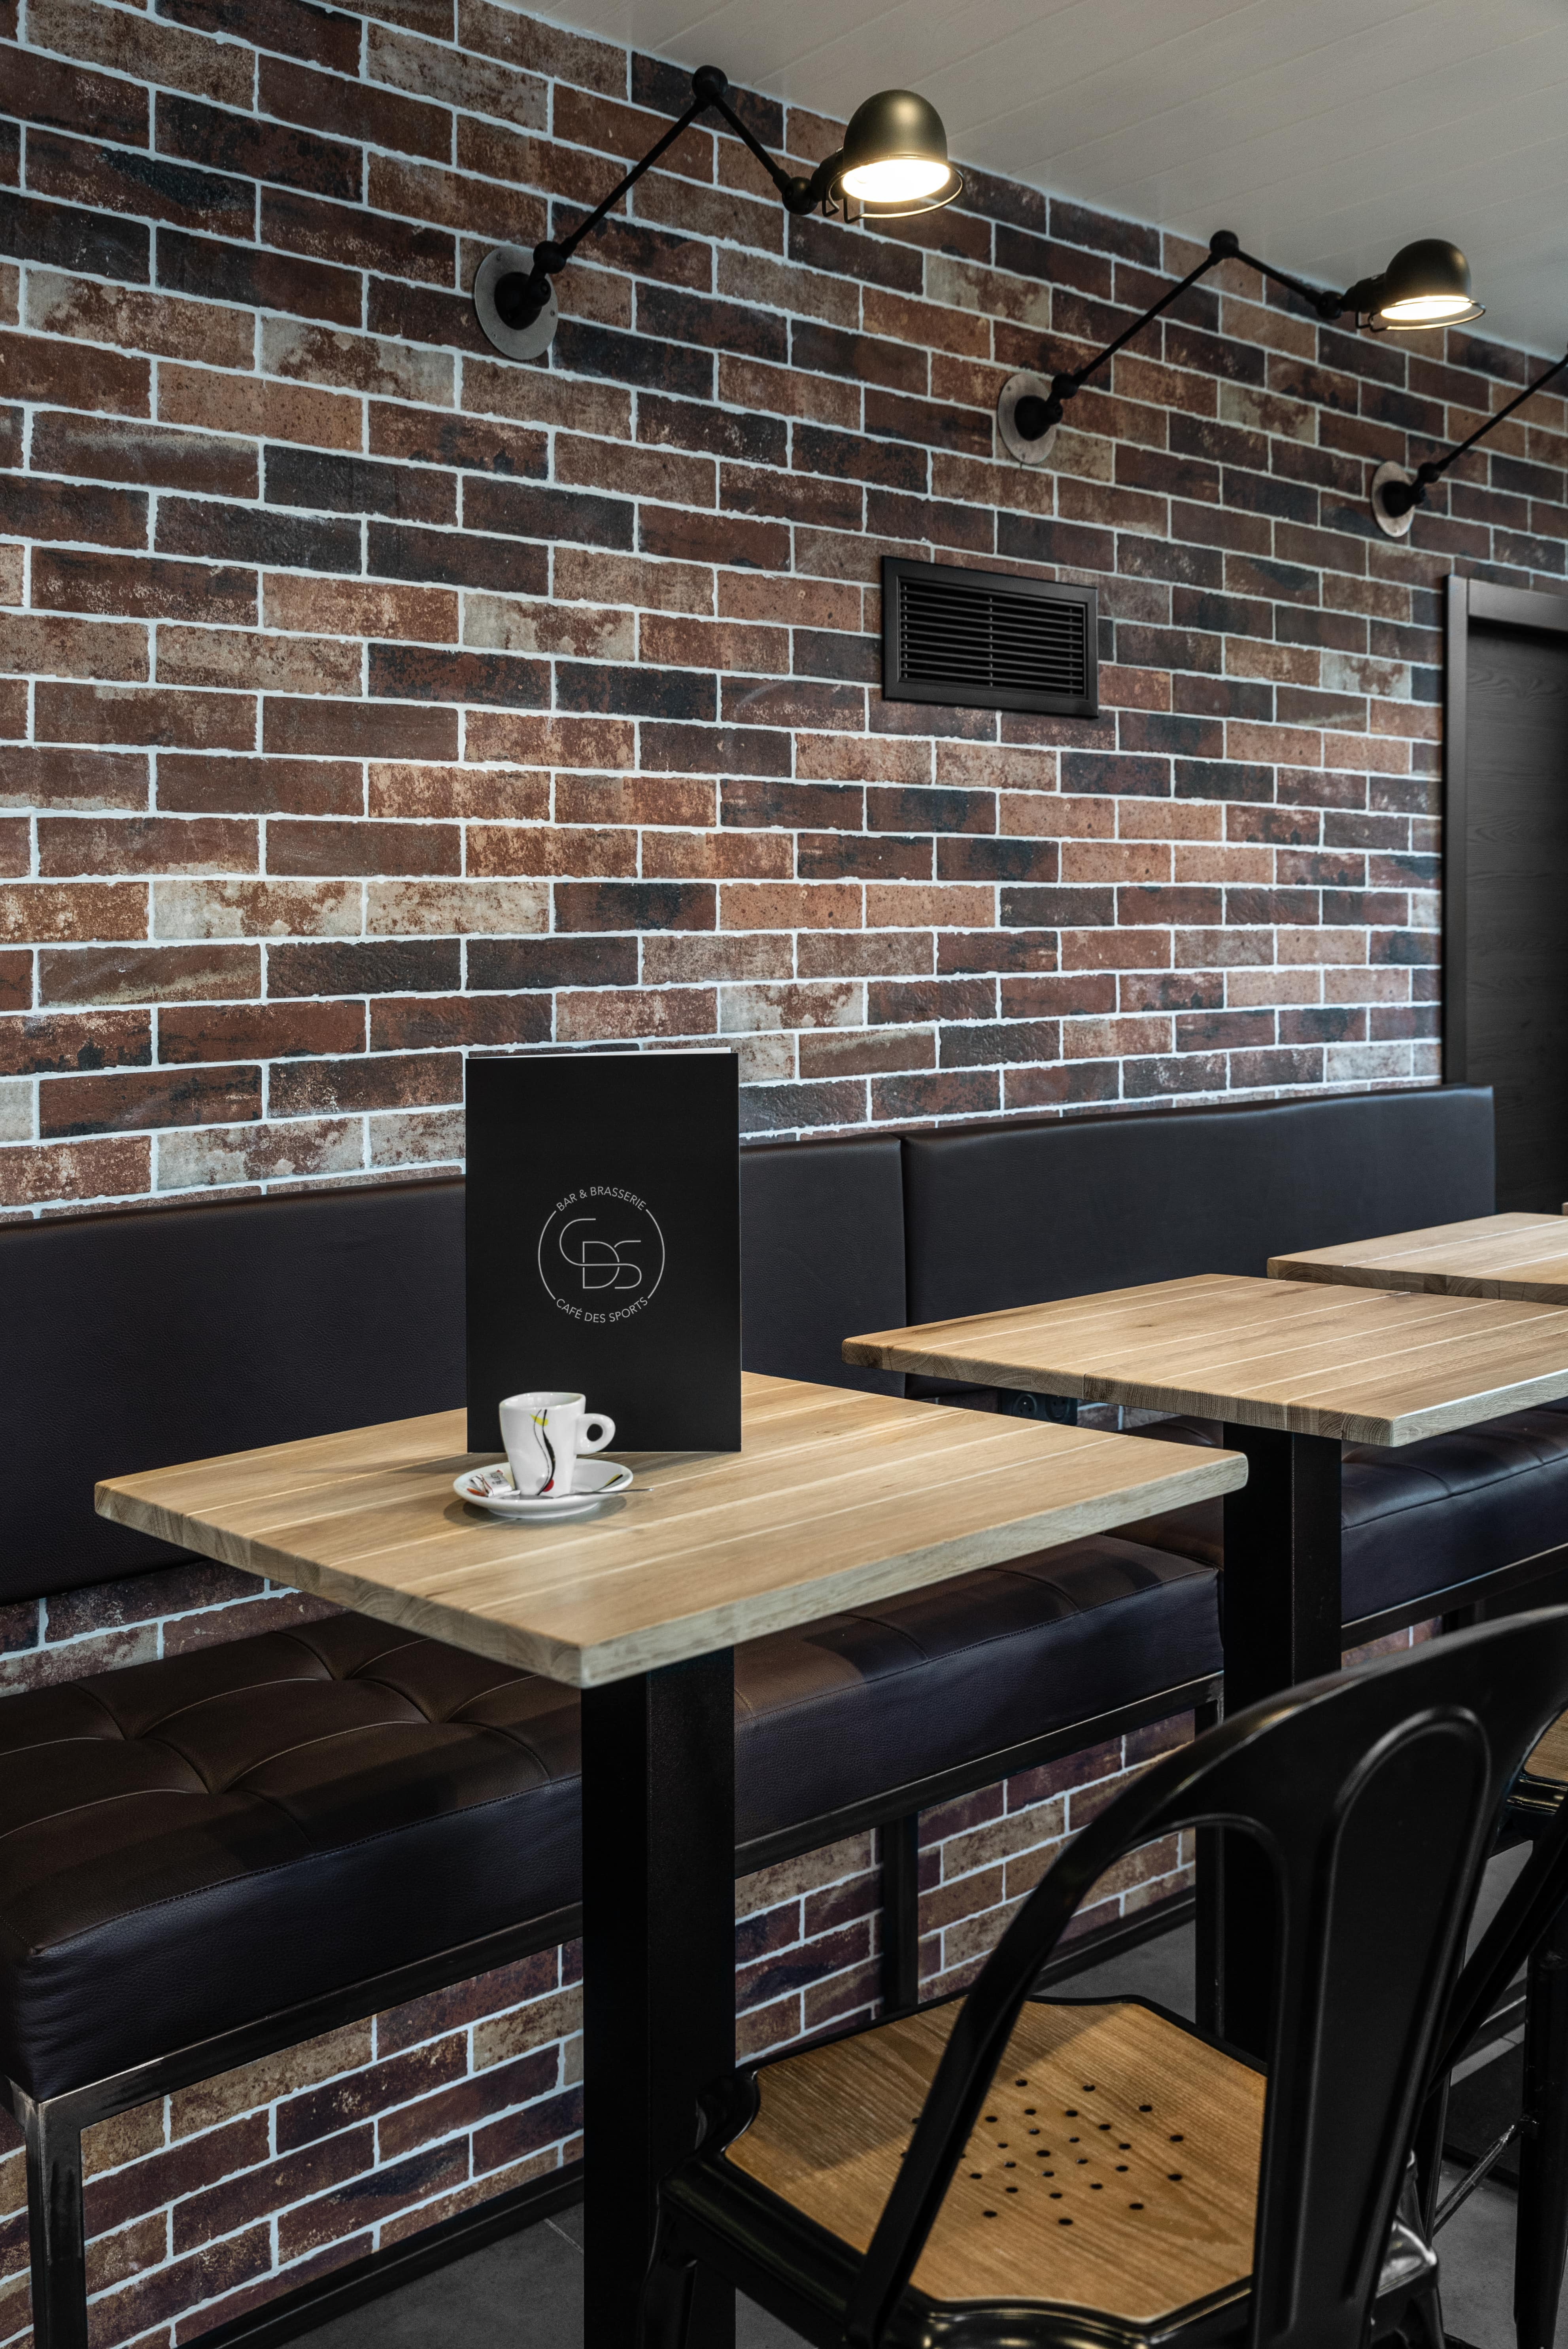 robi design metallique Annecy Cafe des sports Rumilly Le Mesle Photographe-CDS_ESKIS_03-min